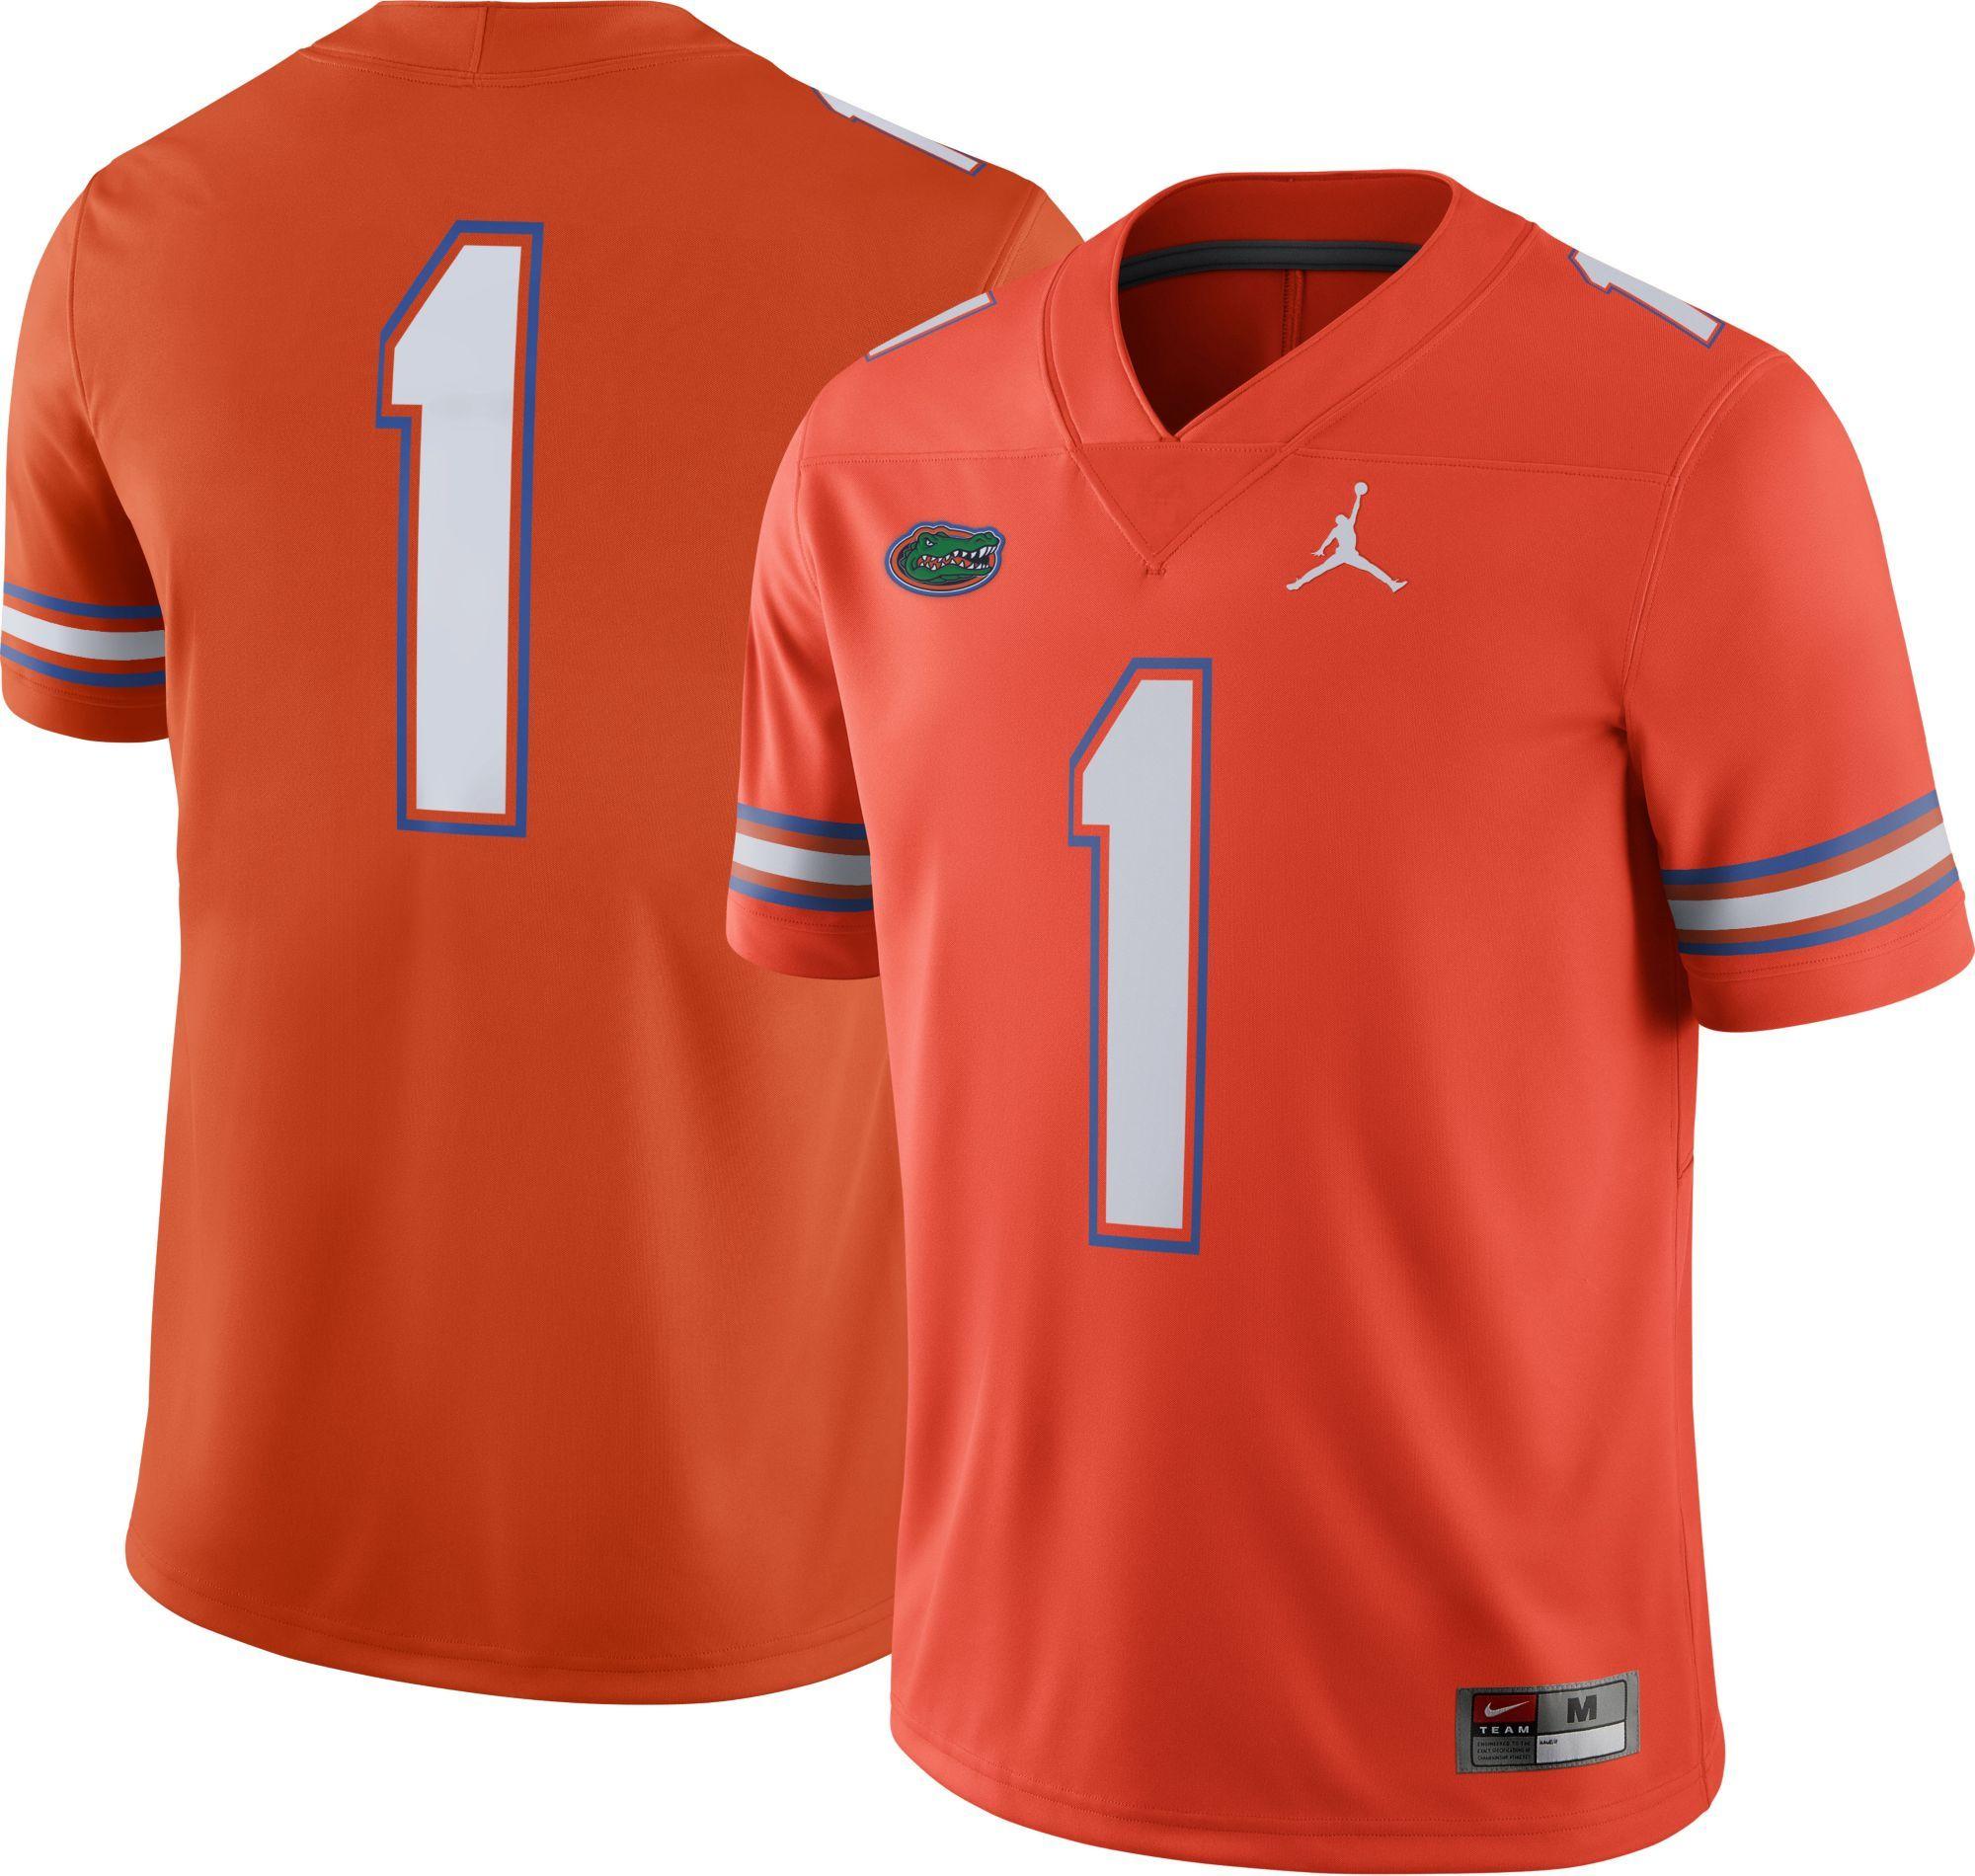 buy online 379d9 3a398 Jordan Men's Florida Gators #1 Orange Game Football Jersey ...